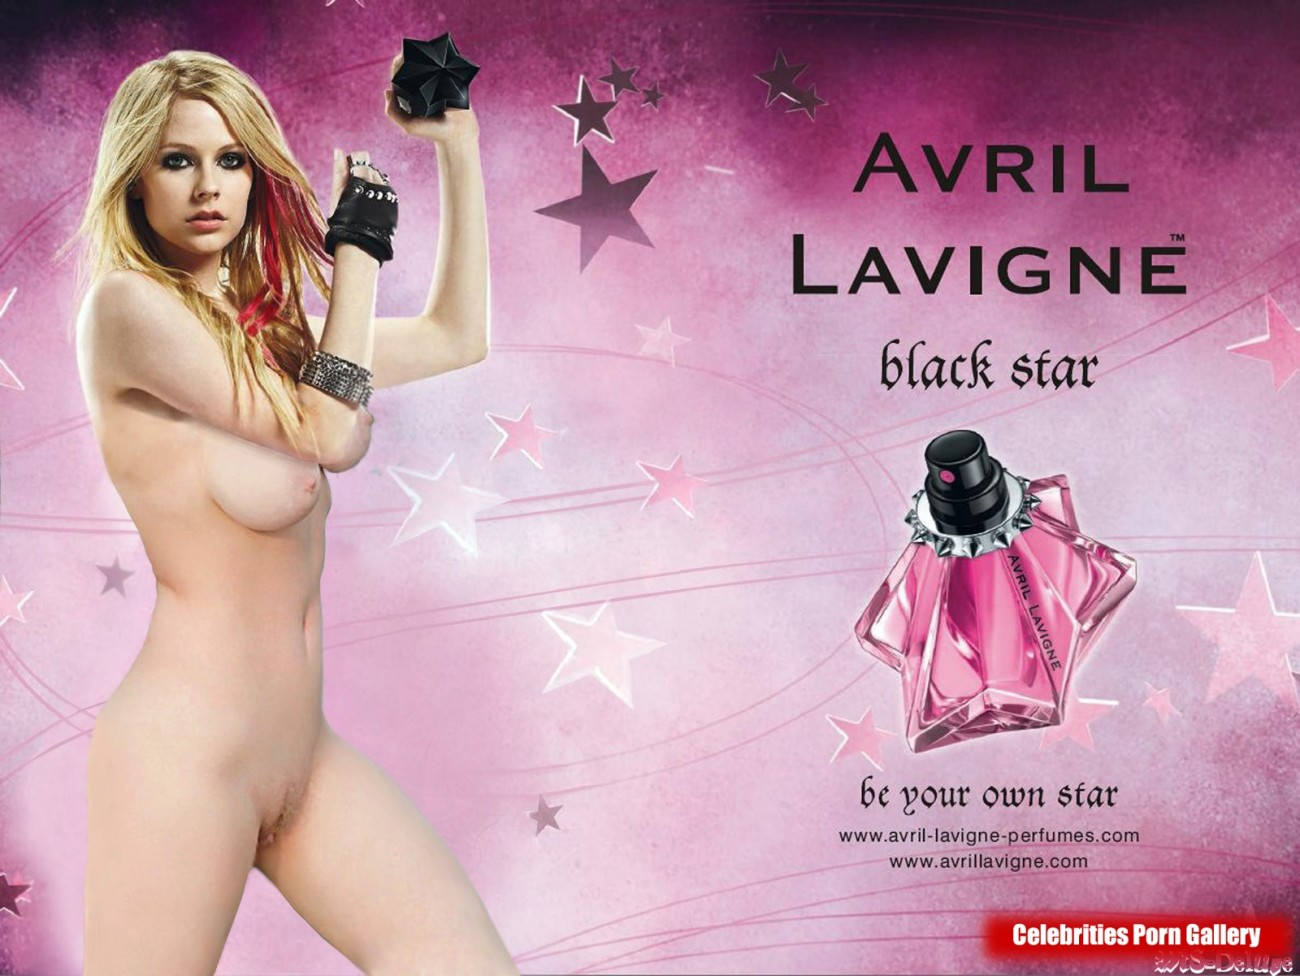 Avril lavigne nude real